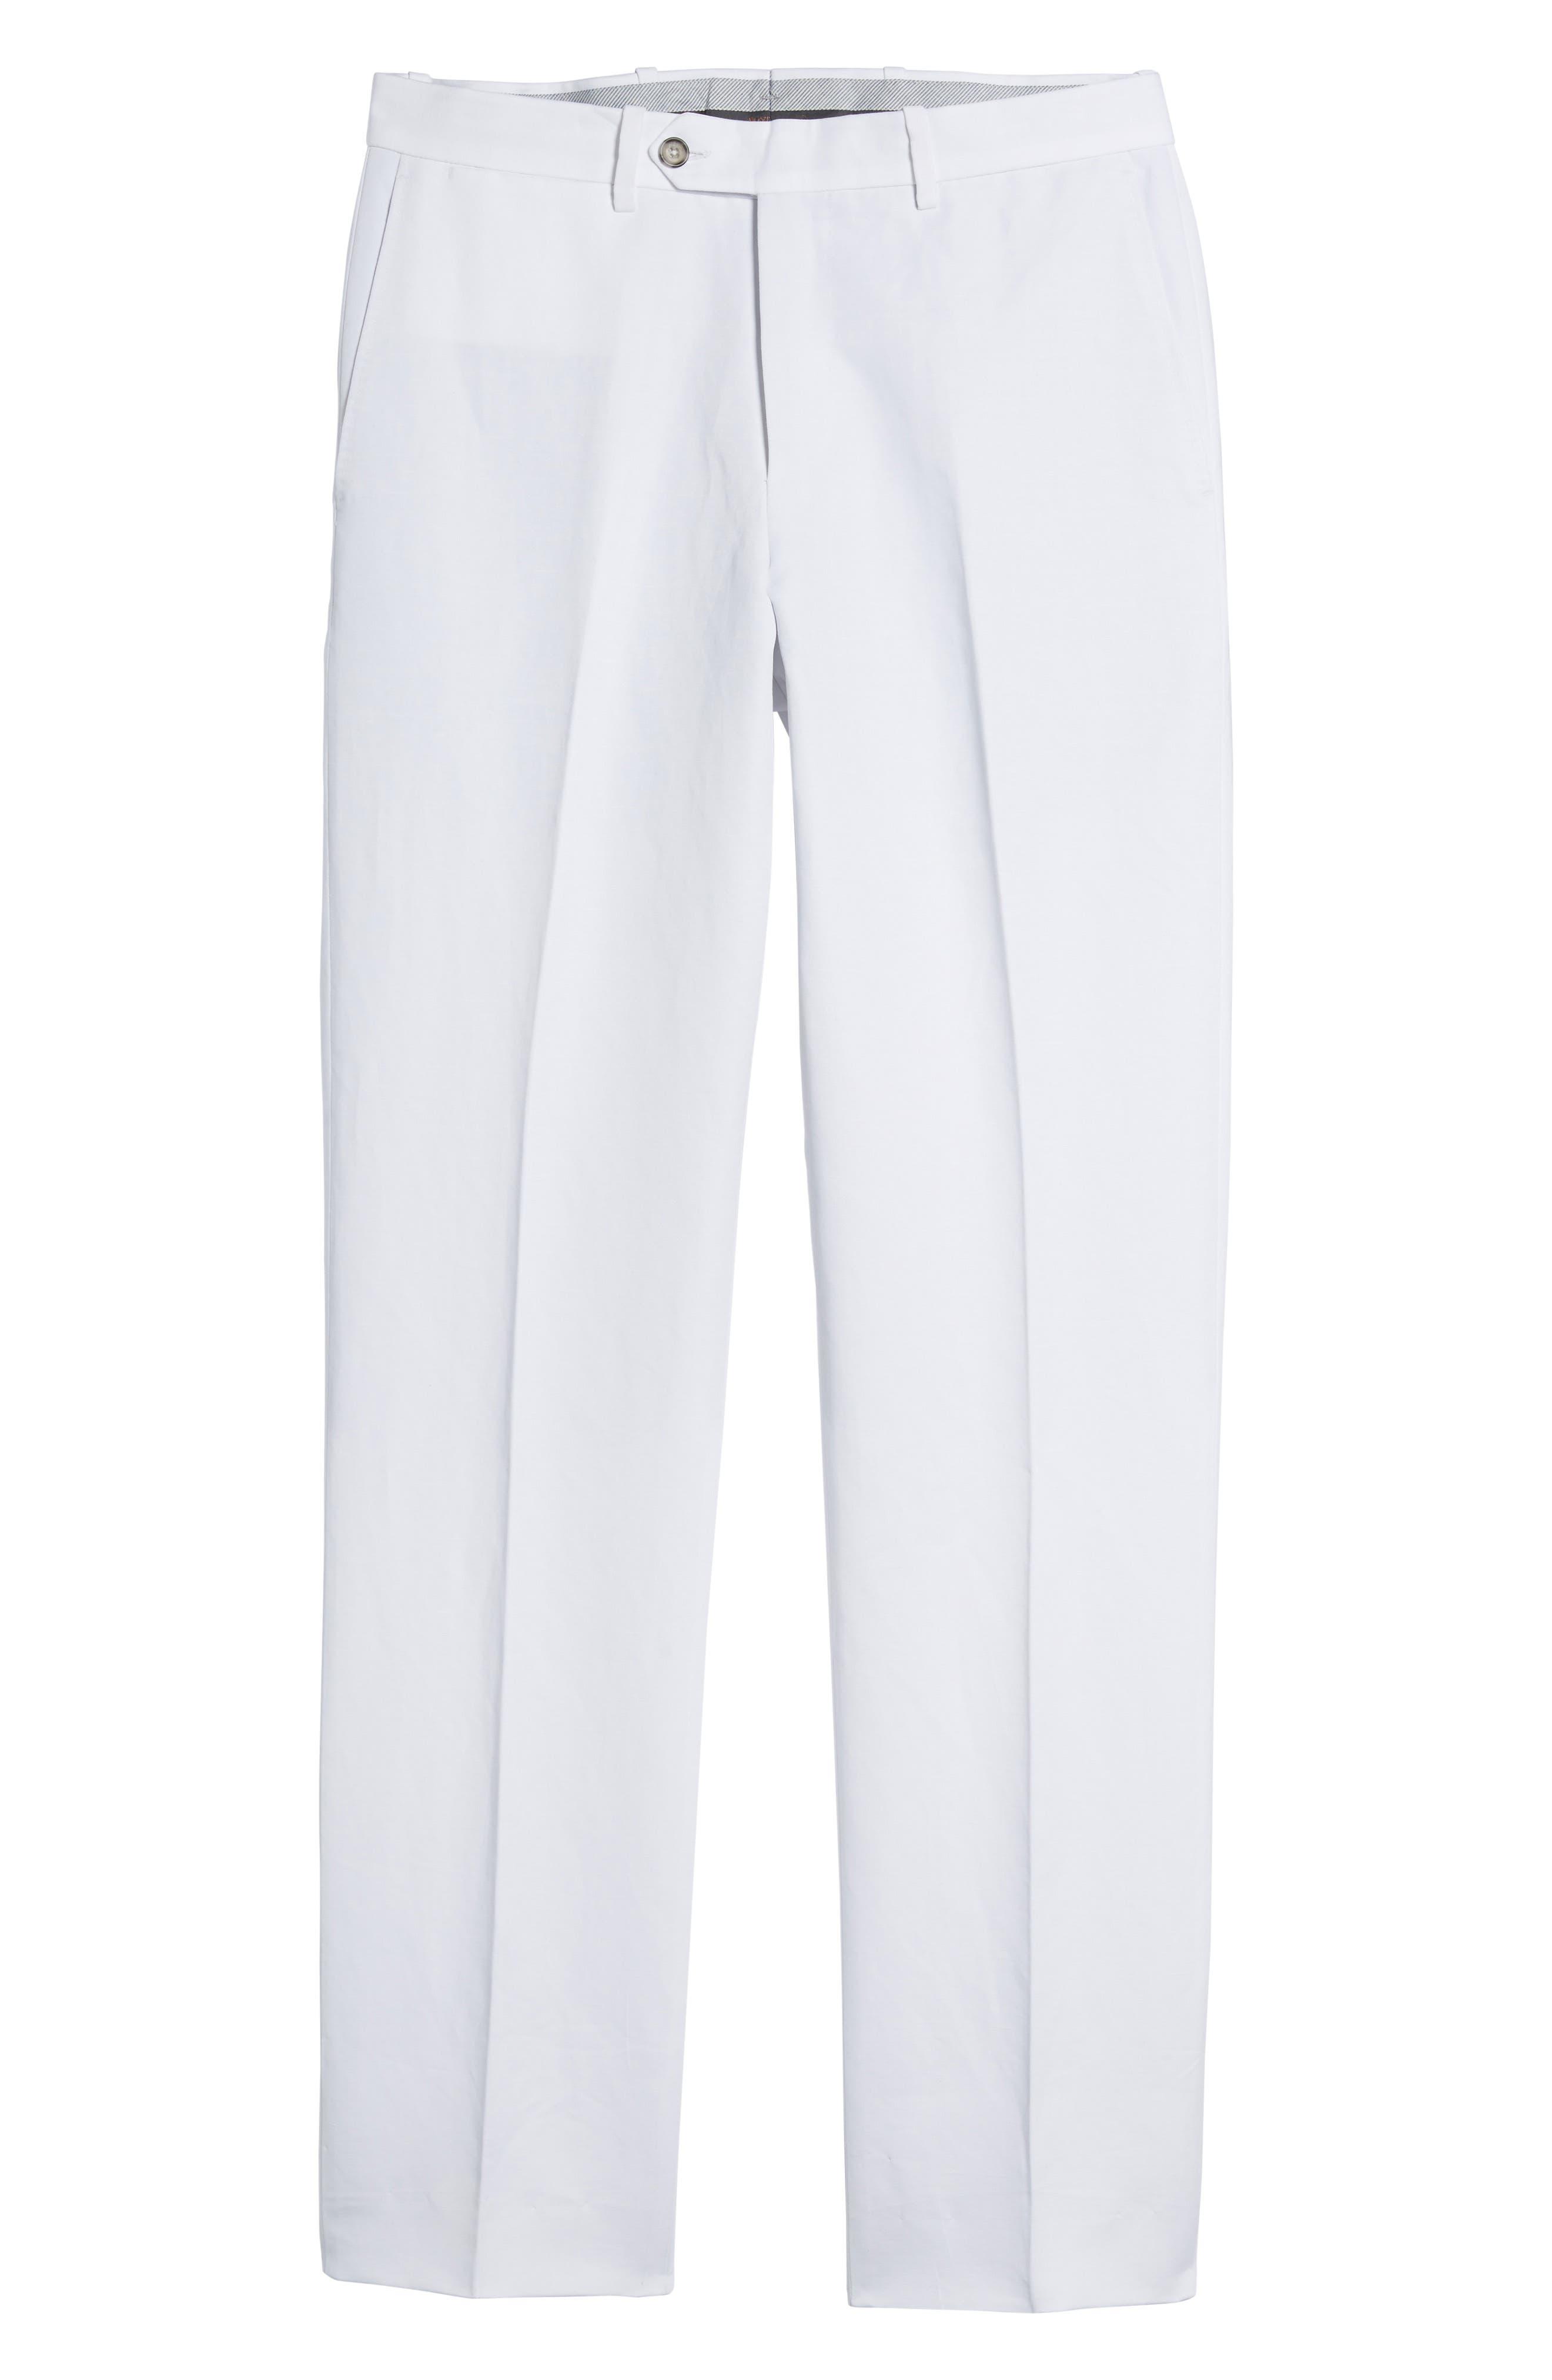 Flat Front Solid Cotton & Linen Trousers,                             Alternate thumbnail 22, color,